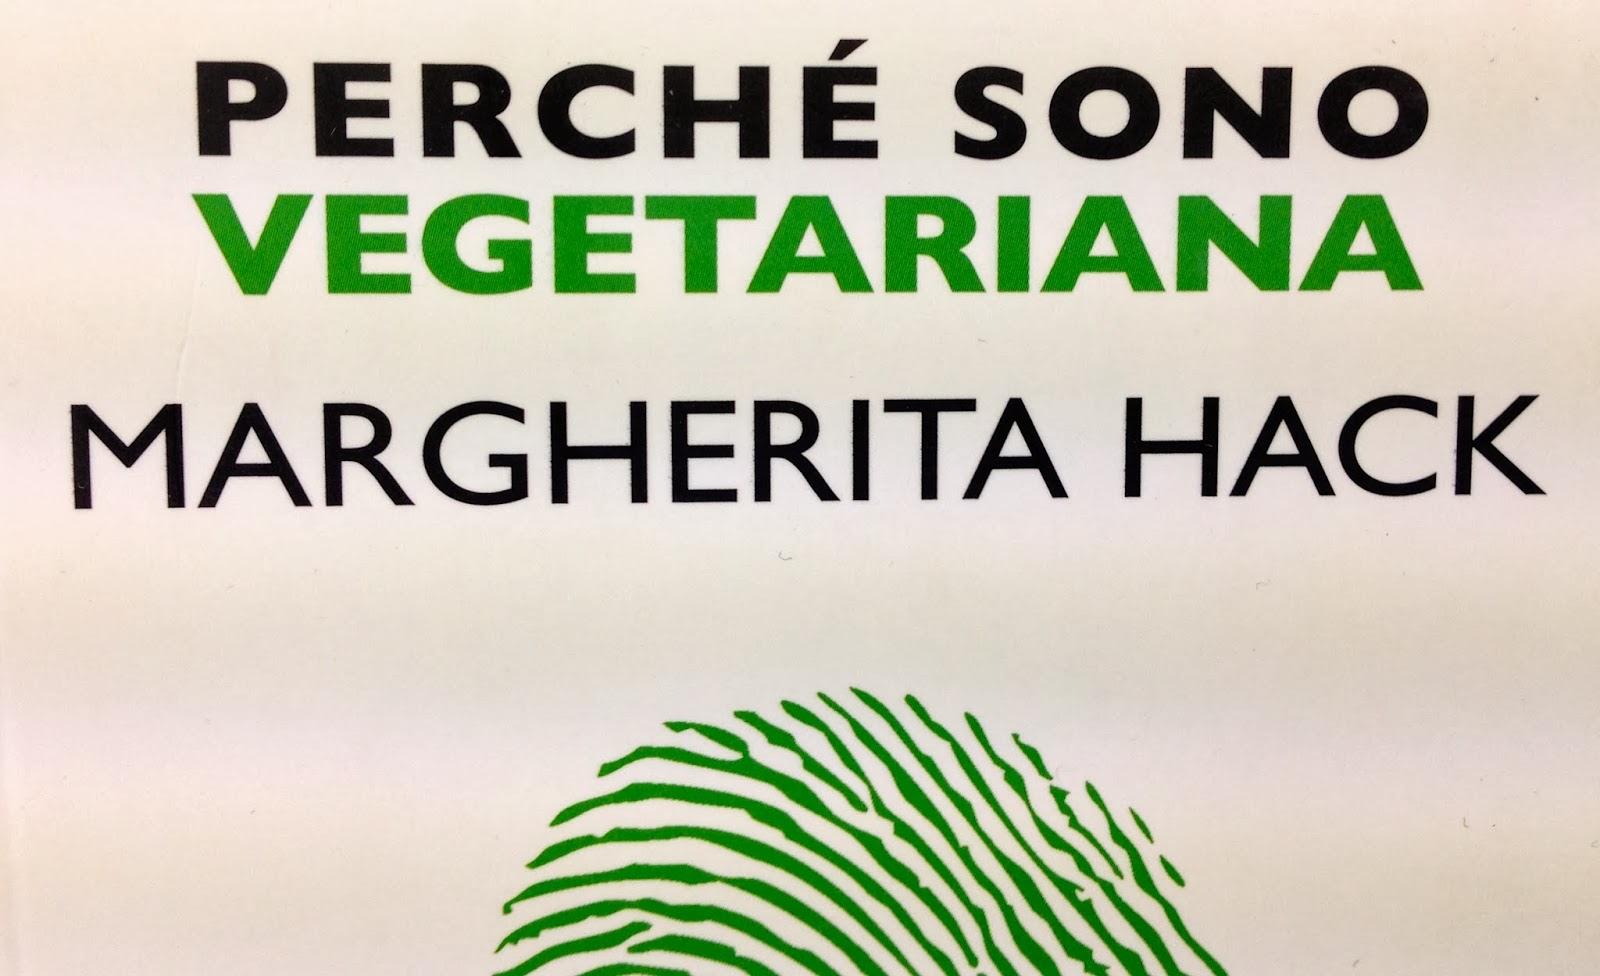 copertina libro margherita hack perchè sono vegetariana